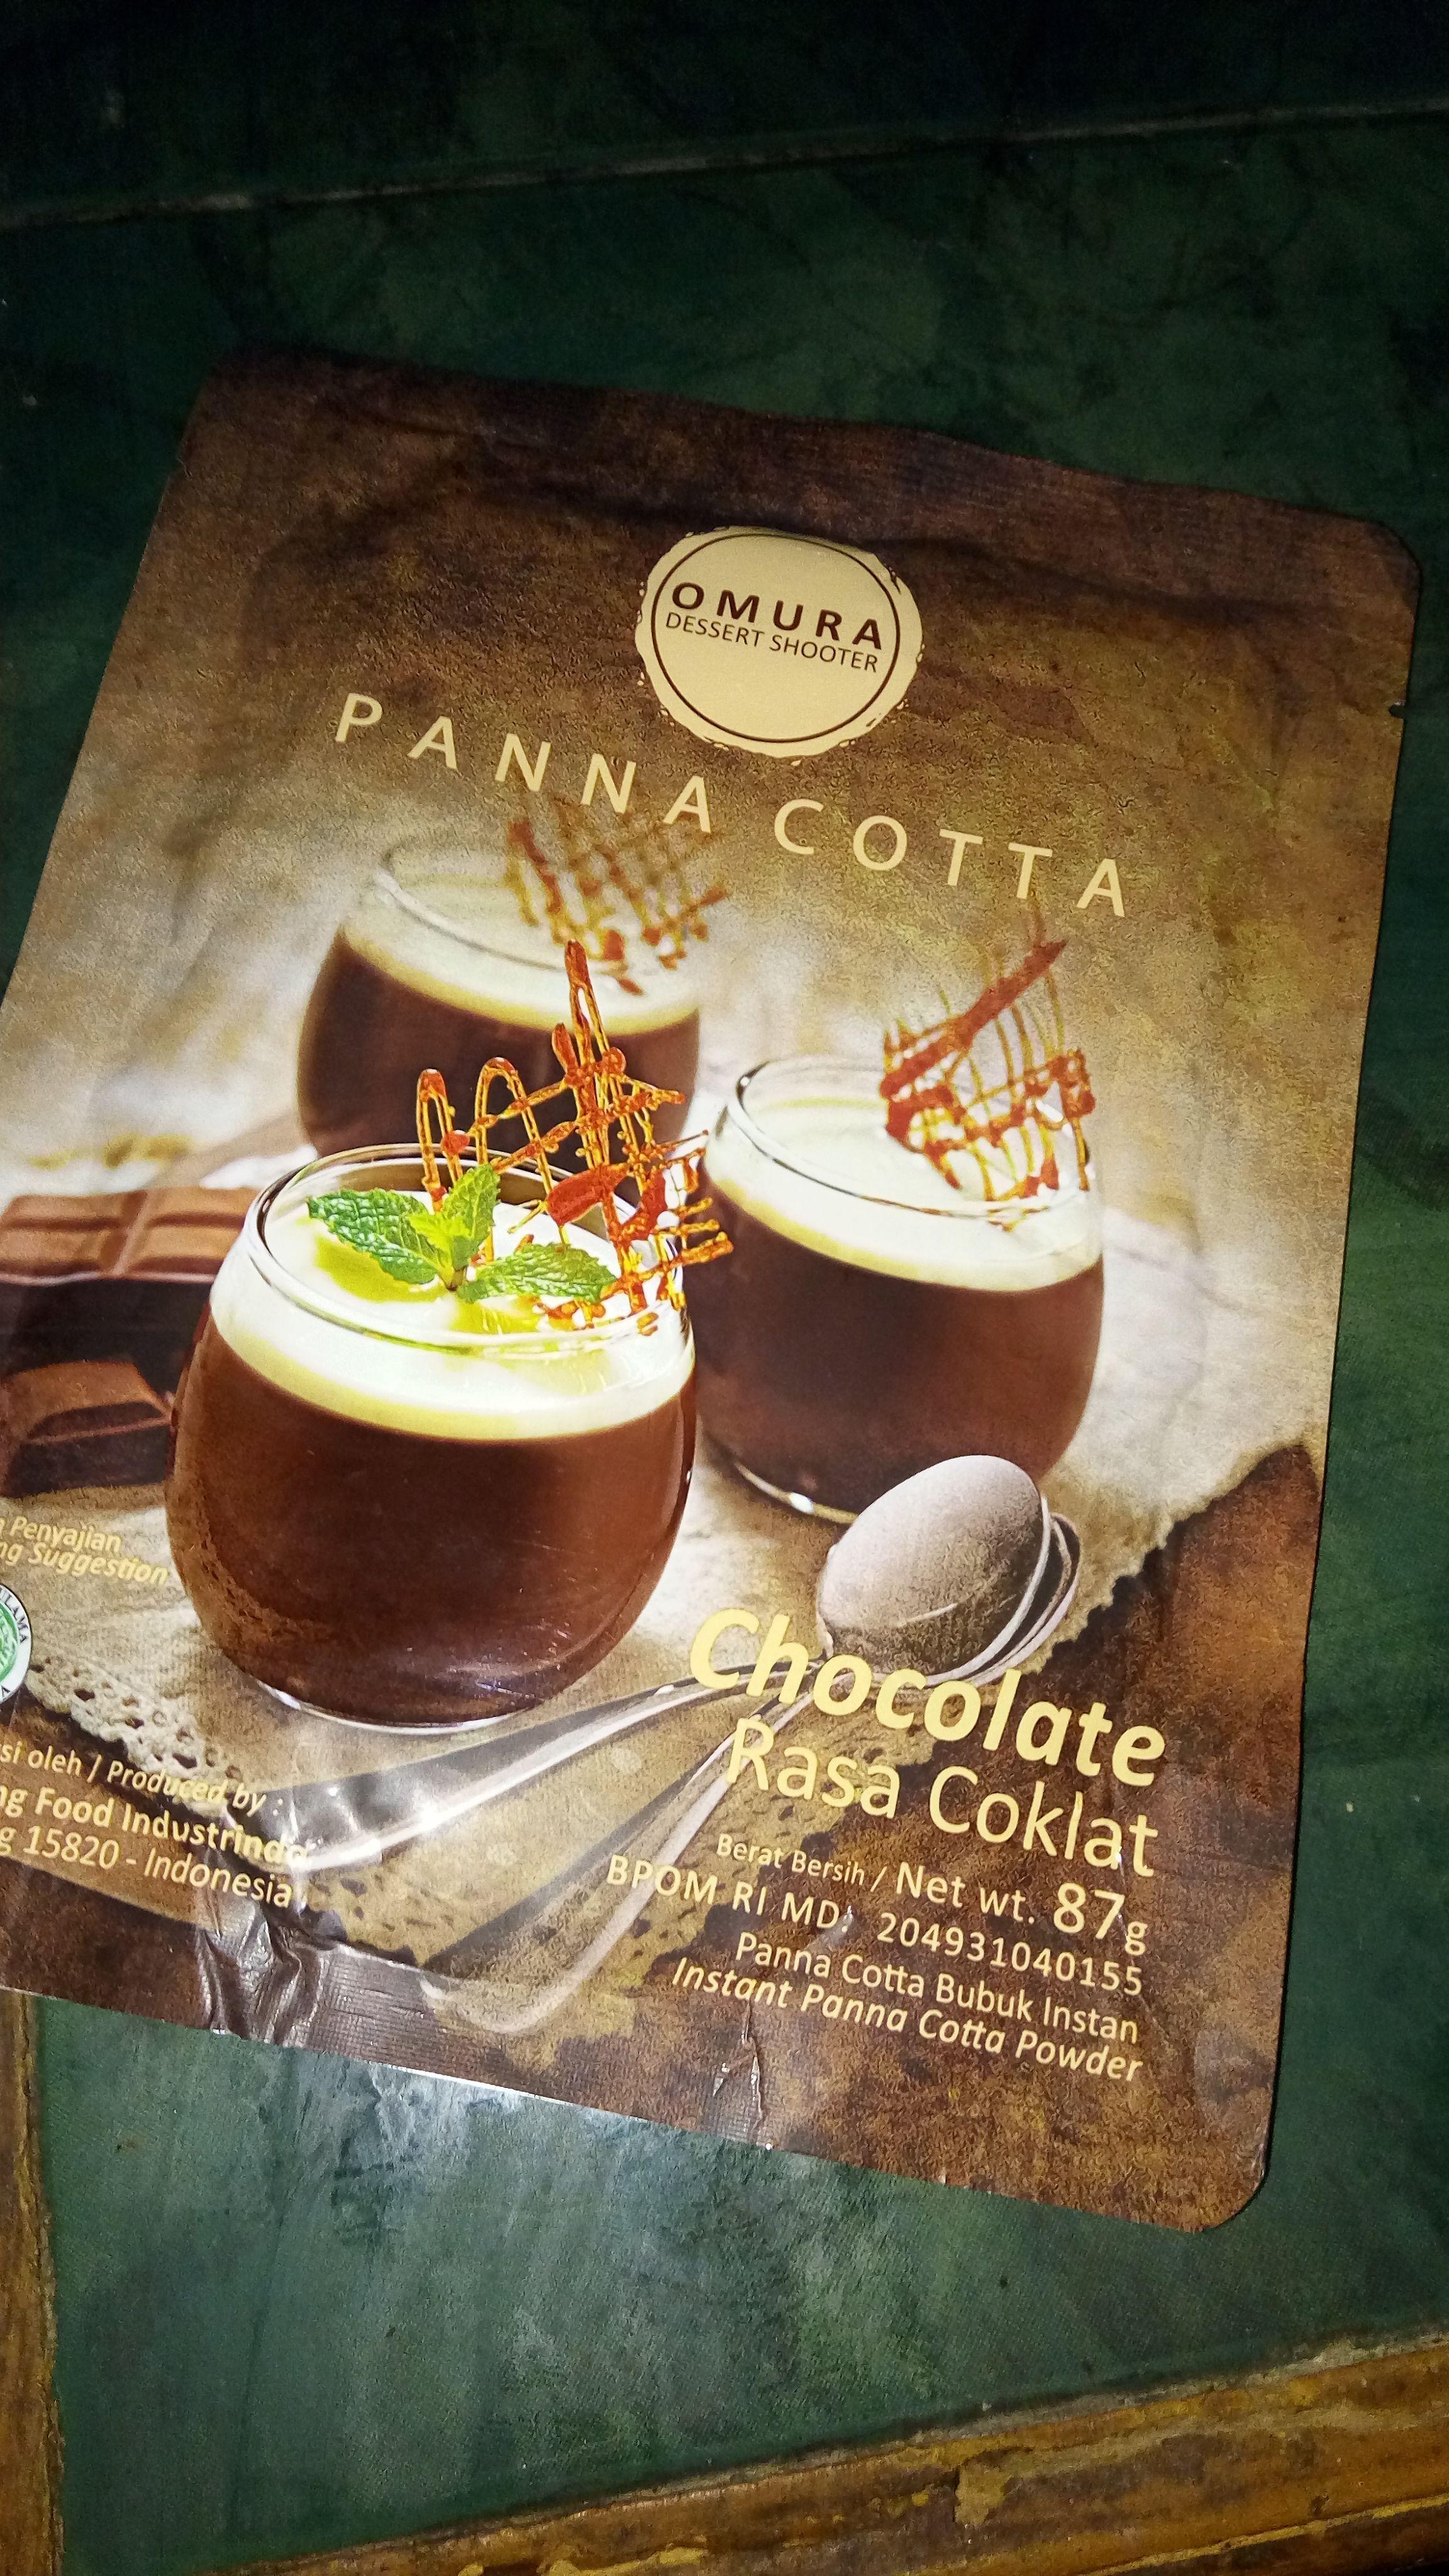 gambar review ke-1 untuk Omura Panna Cotta - Rasa Coklat